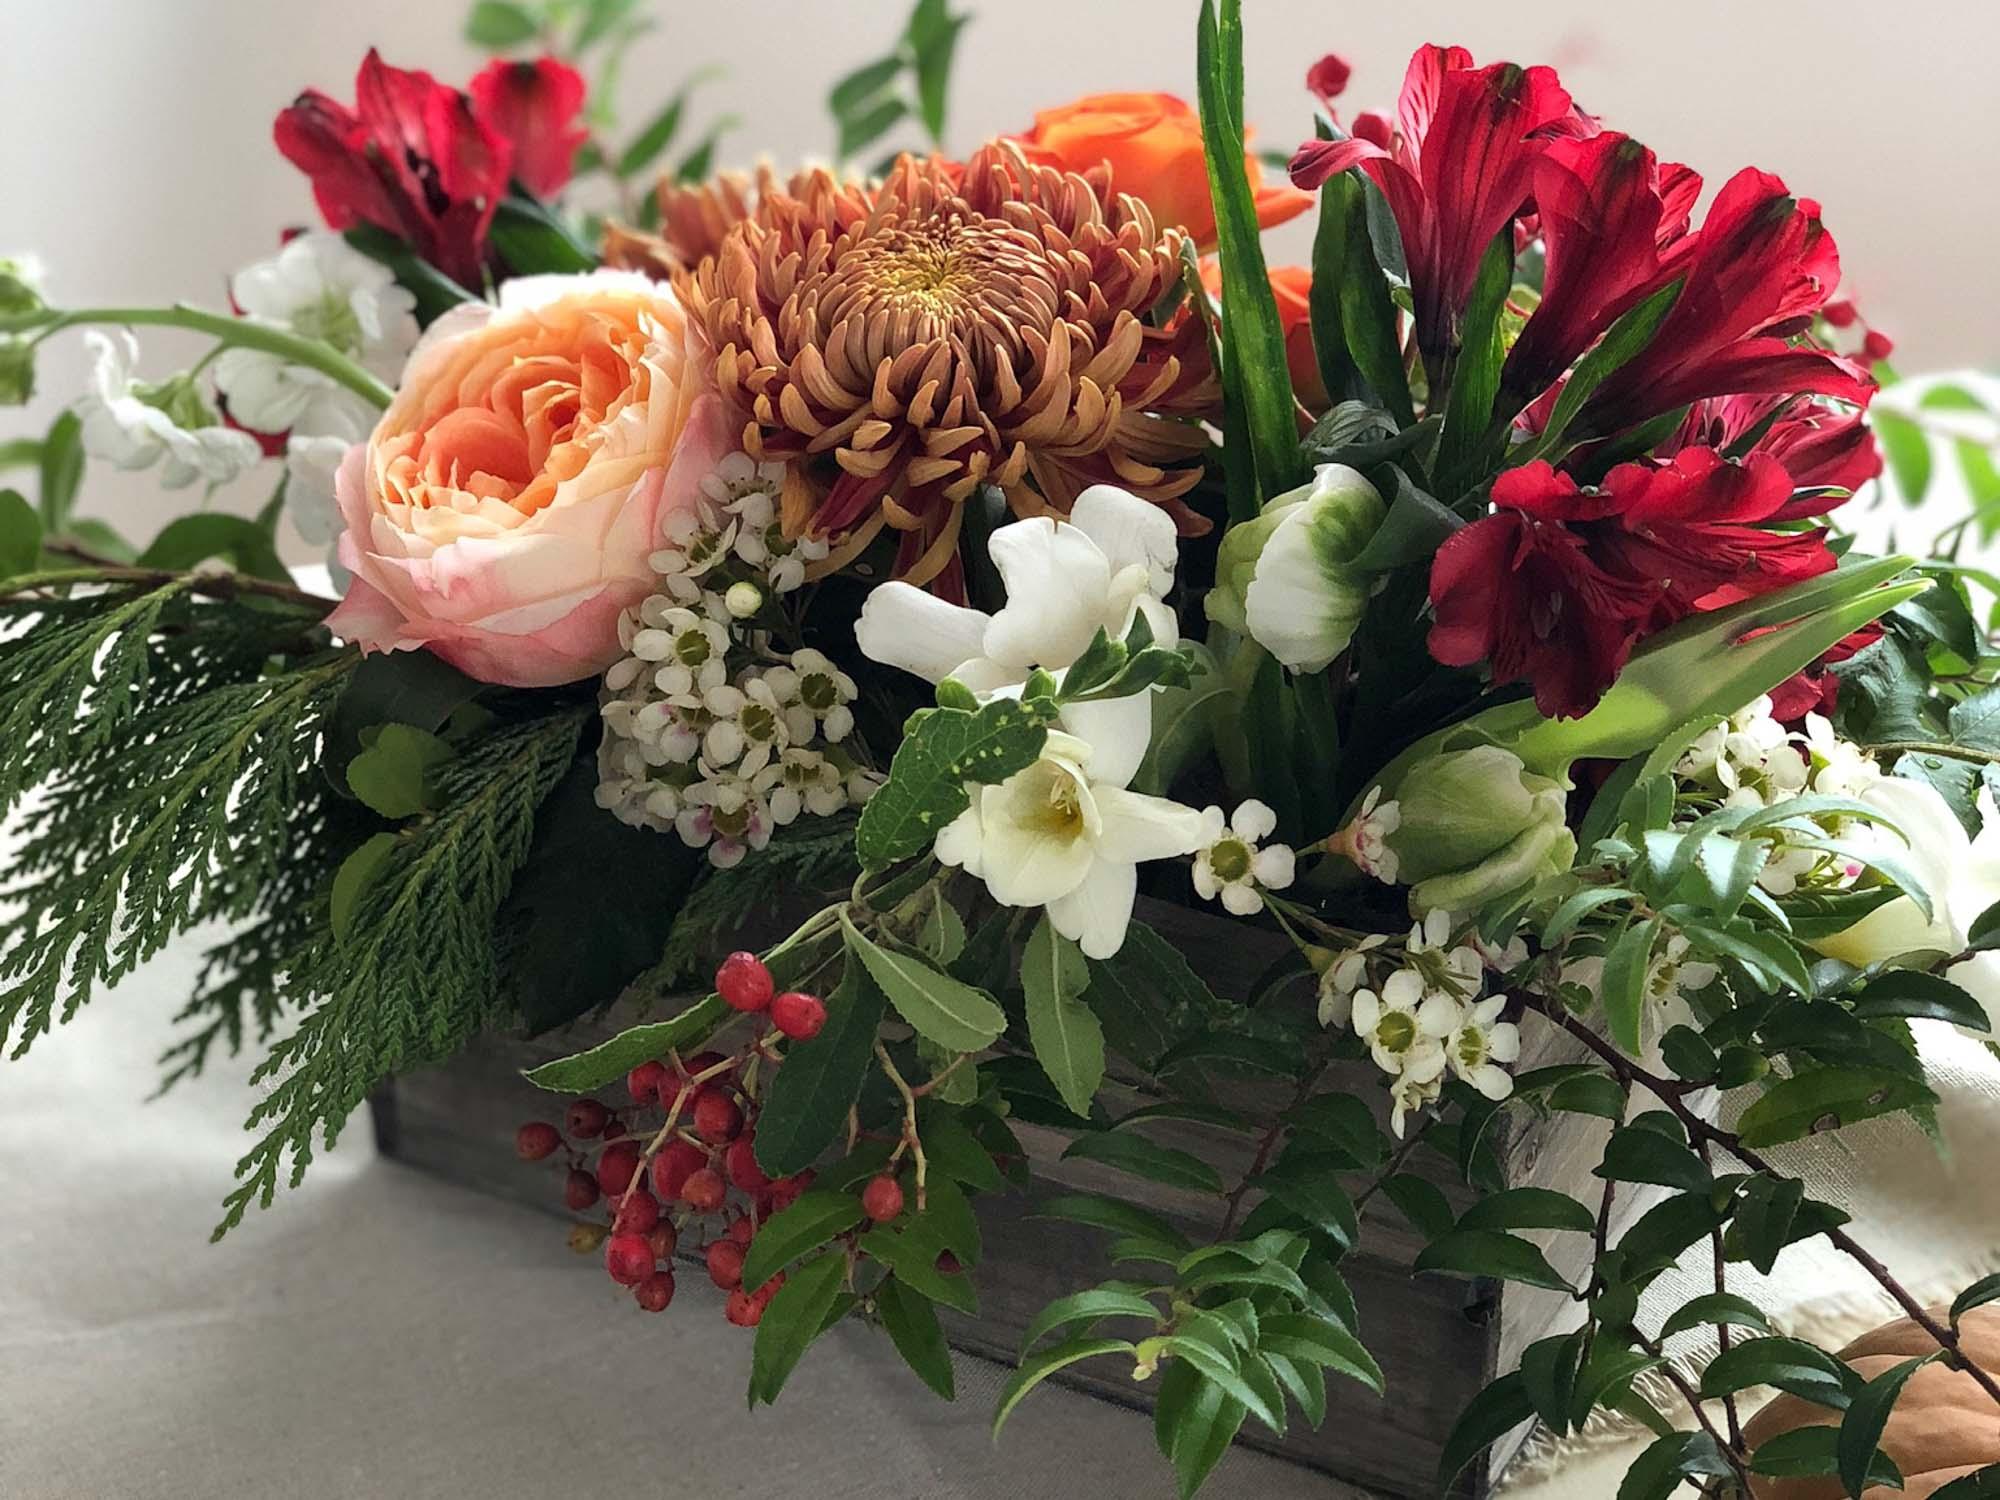 visit-sellwood-moreland-business-alliance_sellwood-flower-company-4.jpg